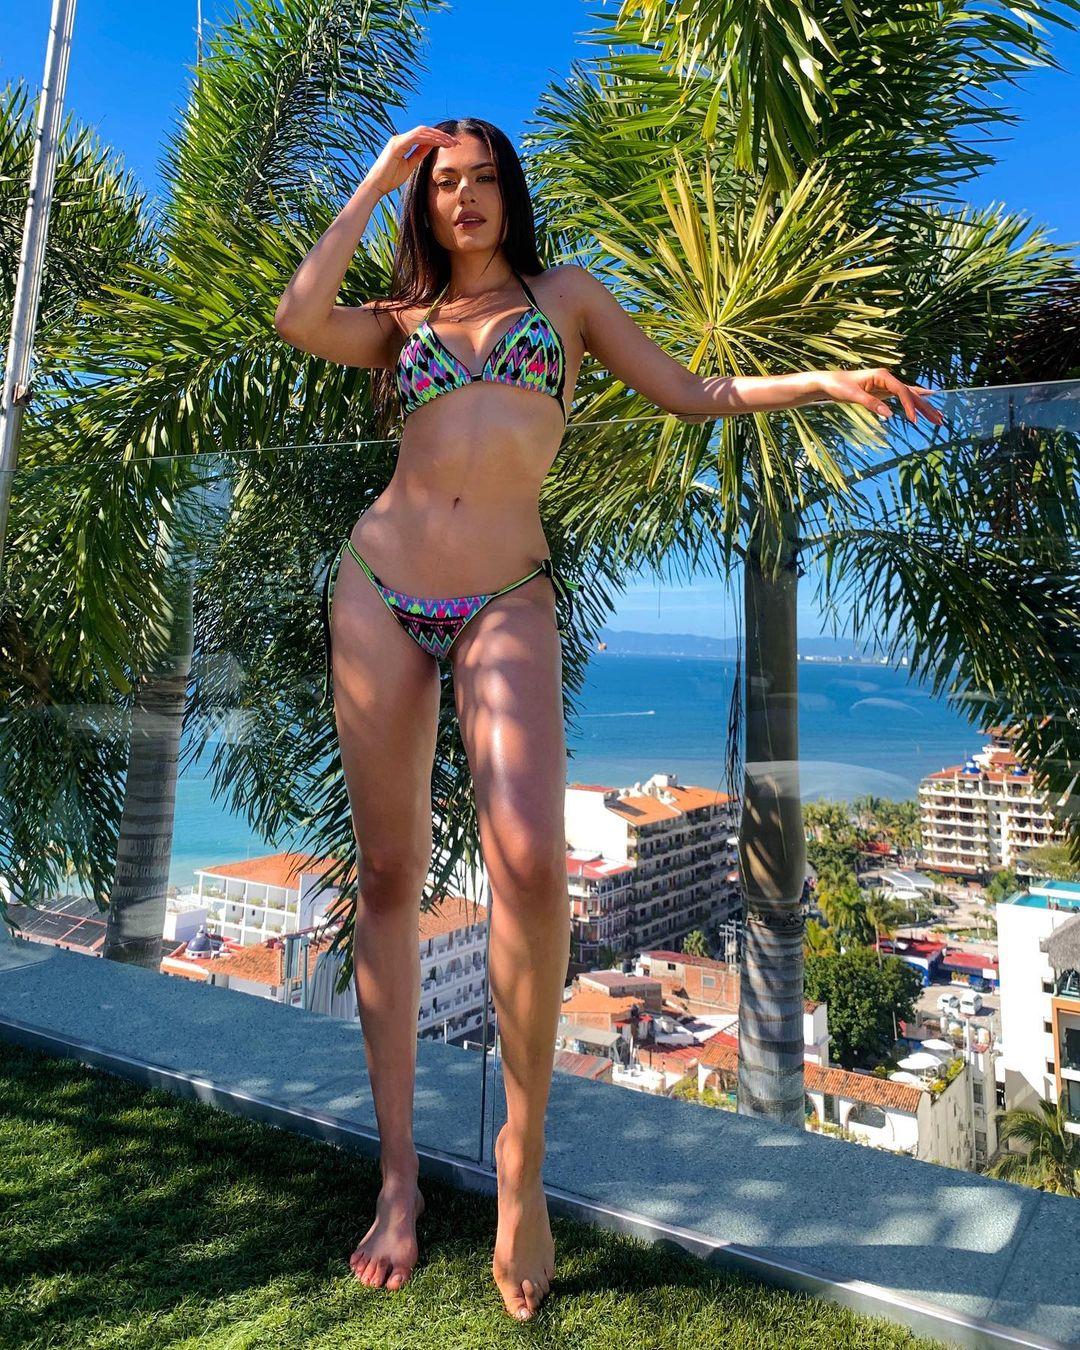 mexicana universal 2020 de bikini. 13500710